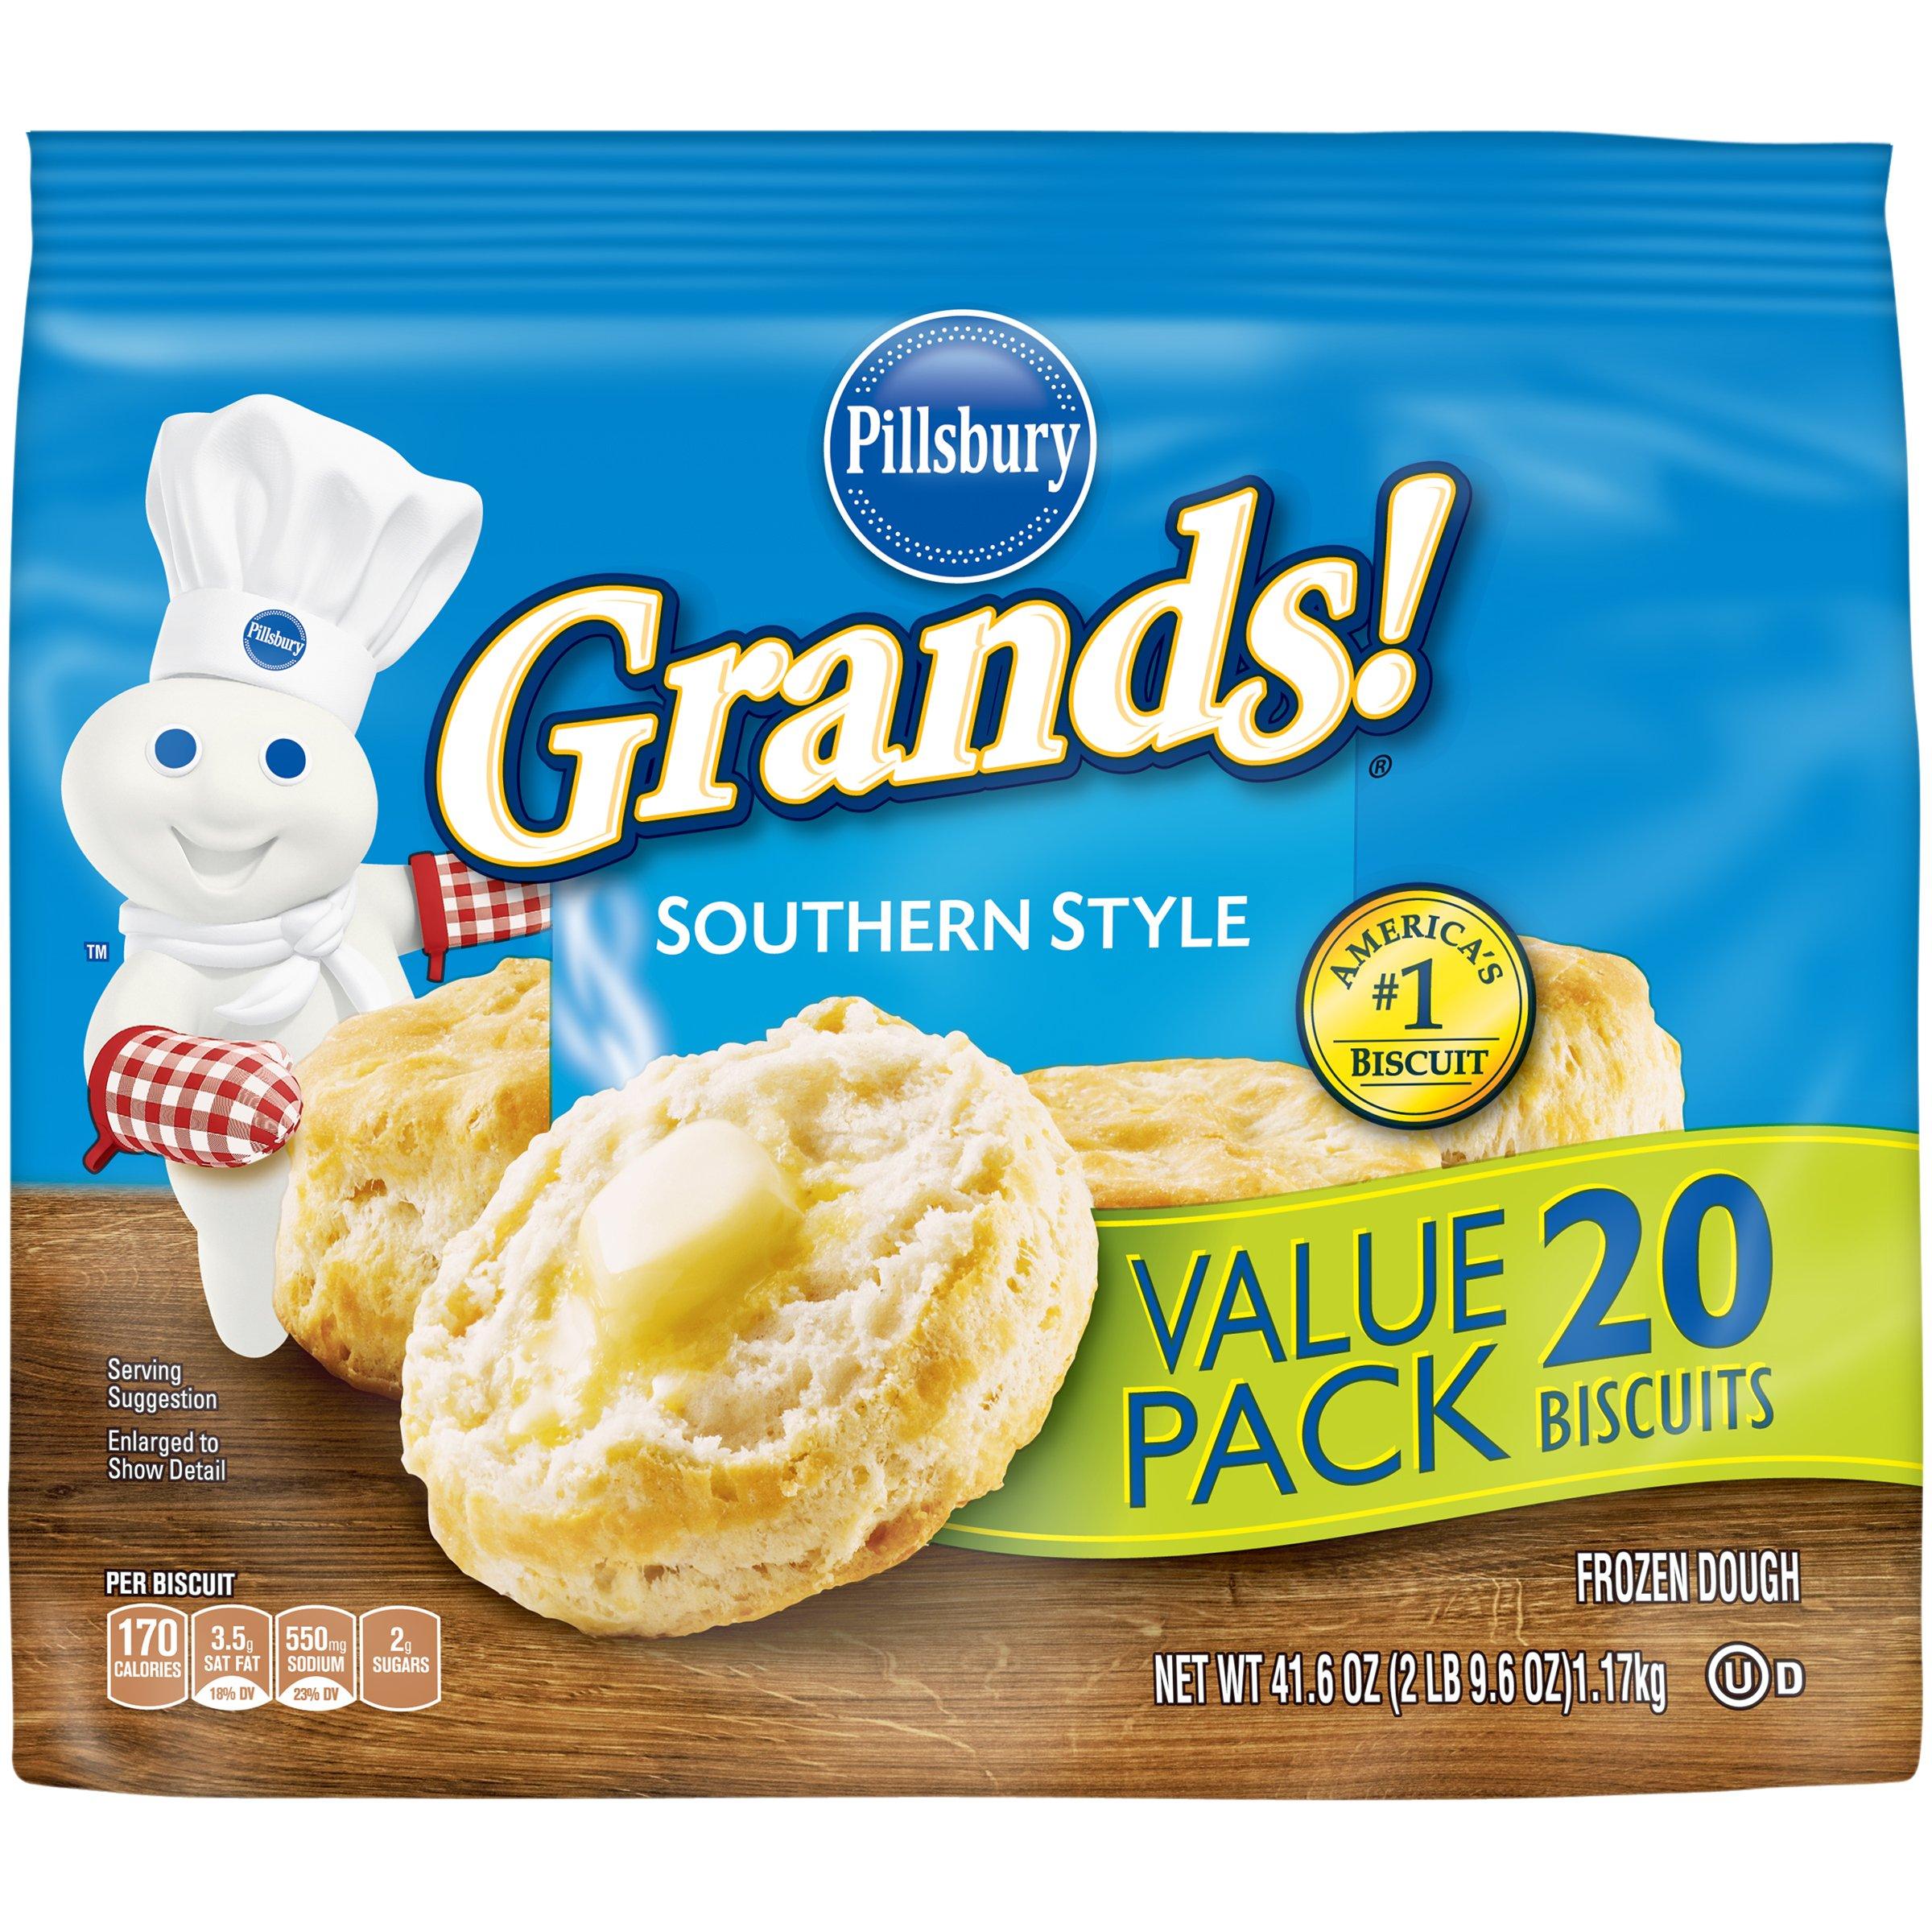 Cheap Frozen Biscuits Brands find Frozen Biscuits Brands deals on